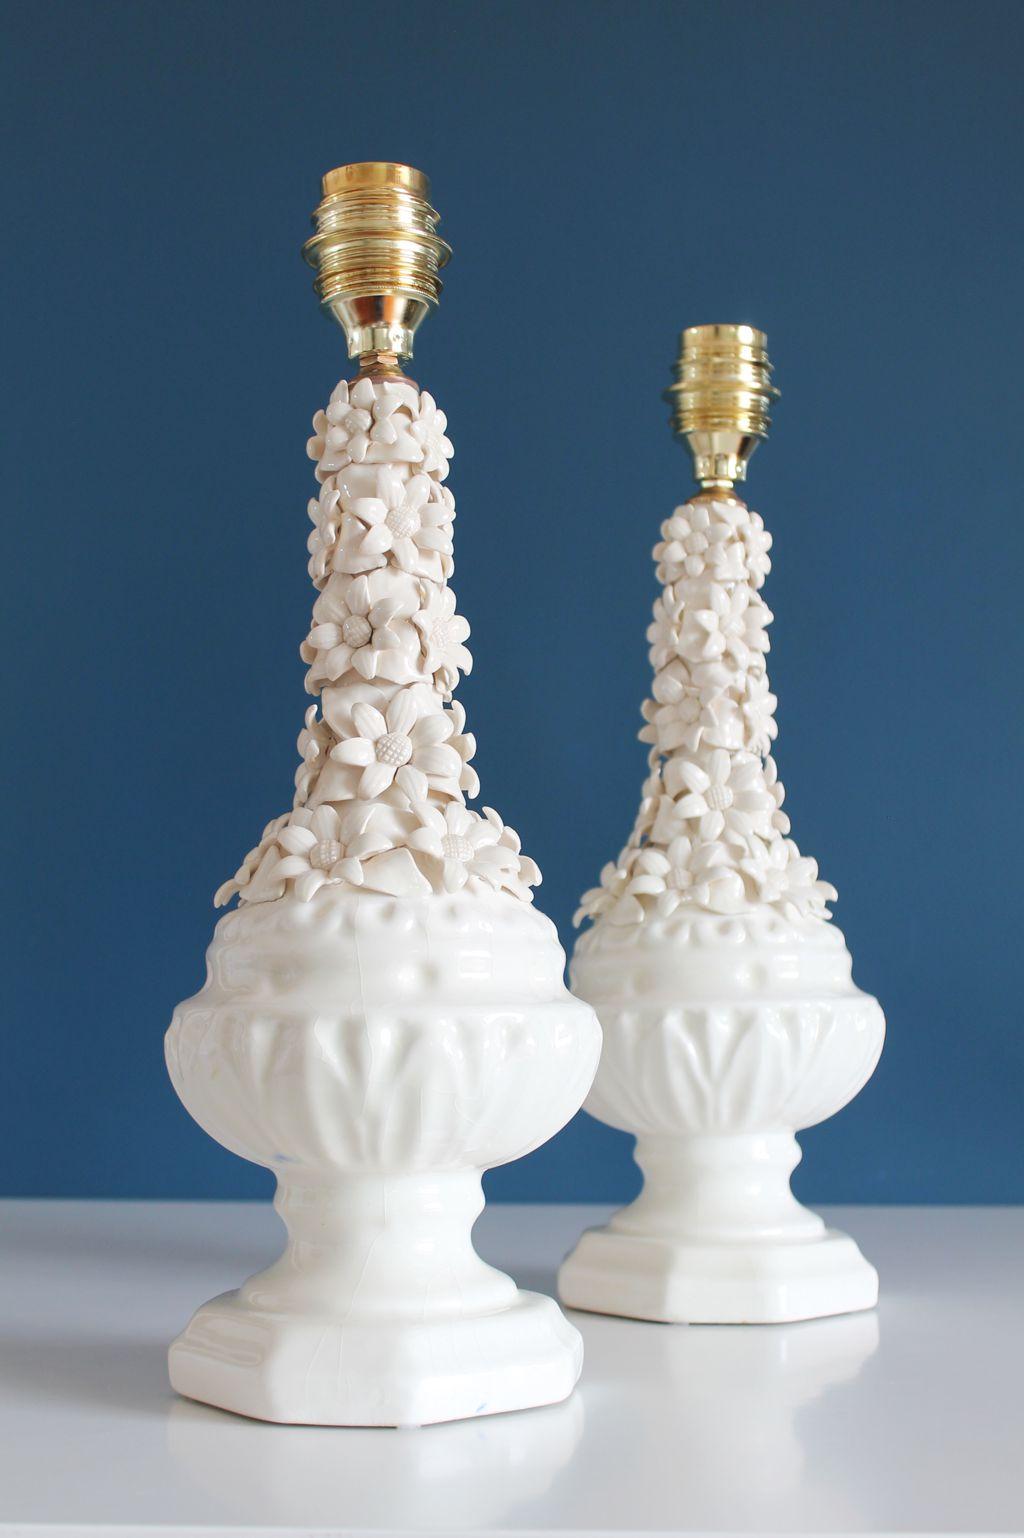 Pareja de l mparas de cer mica blanca de manises vintage - Lamparas de ceramica ...